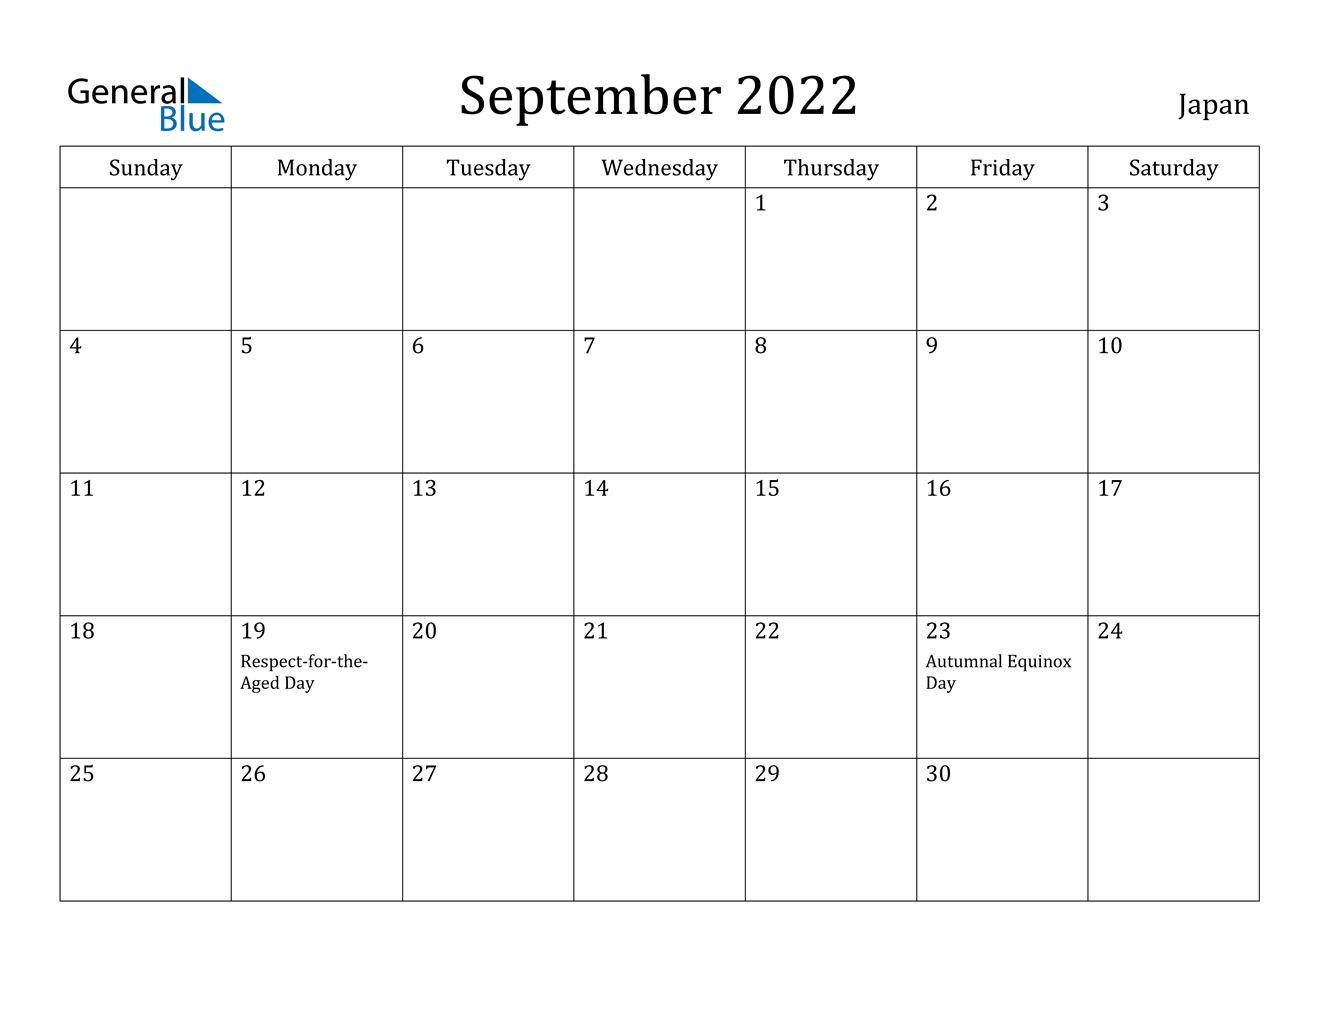 September 2022 Calendar - Japan